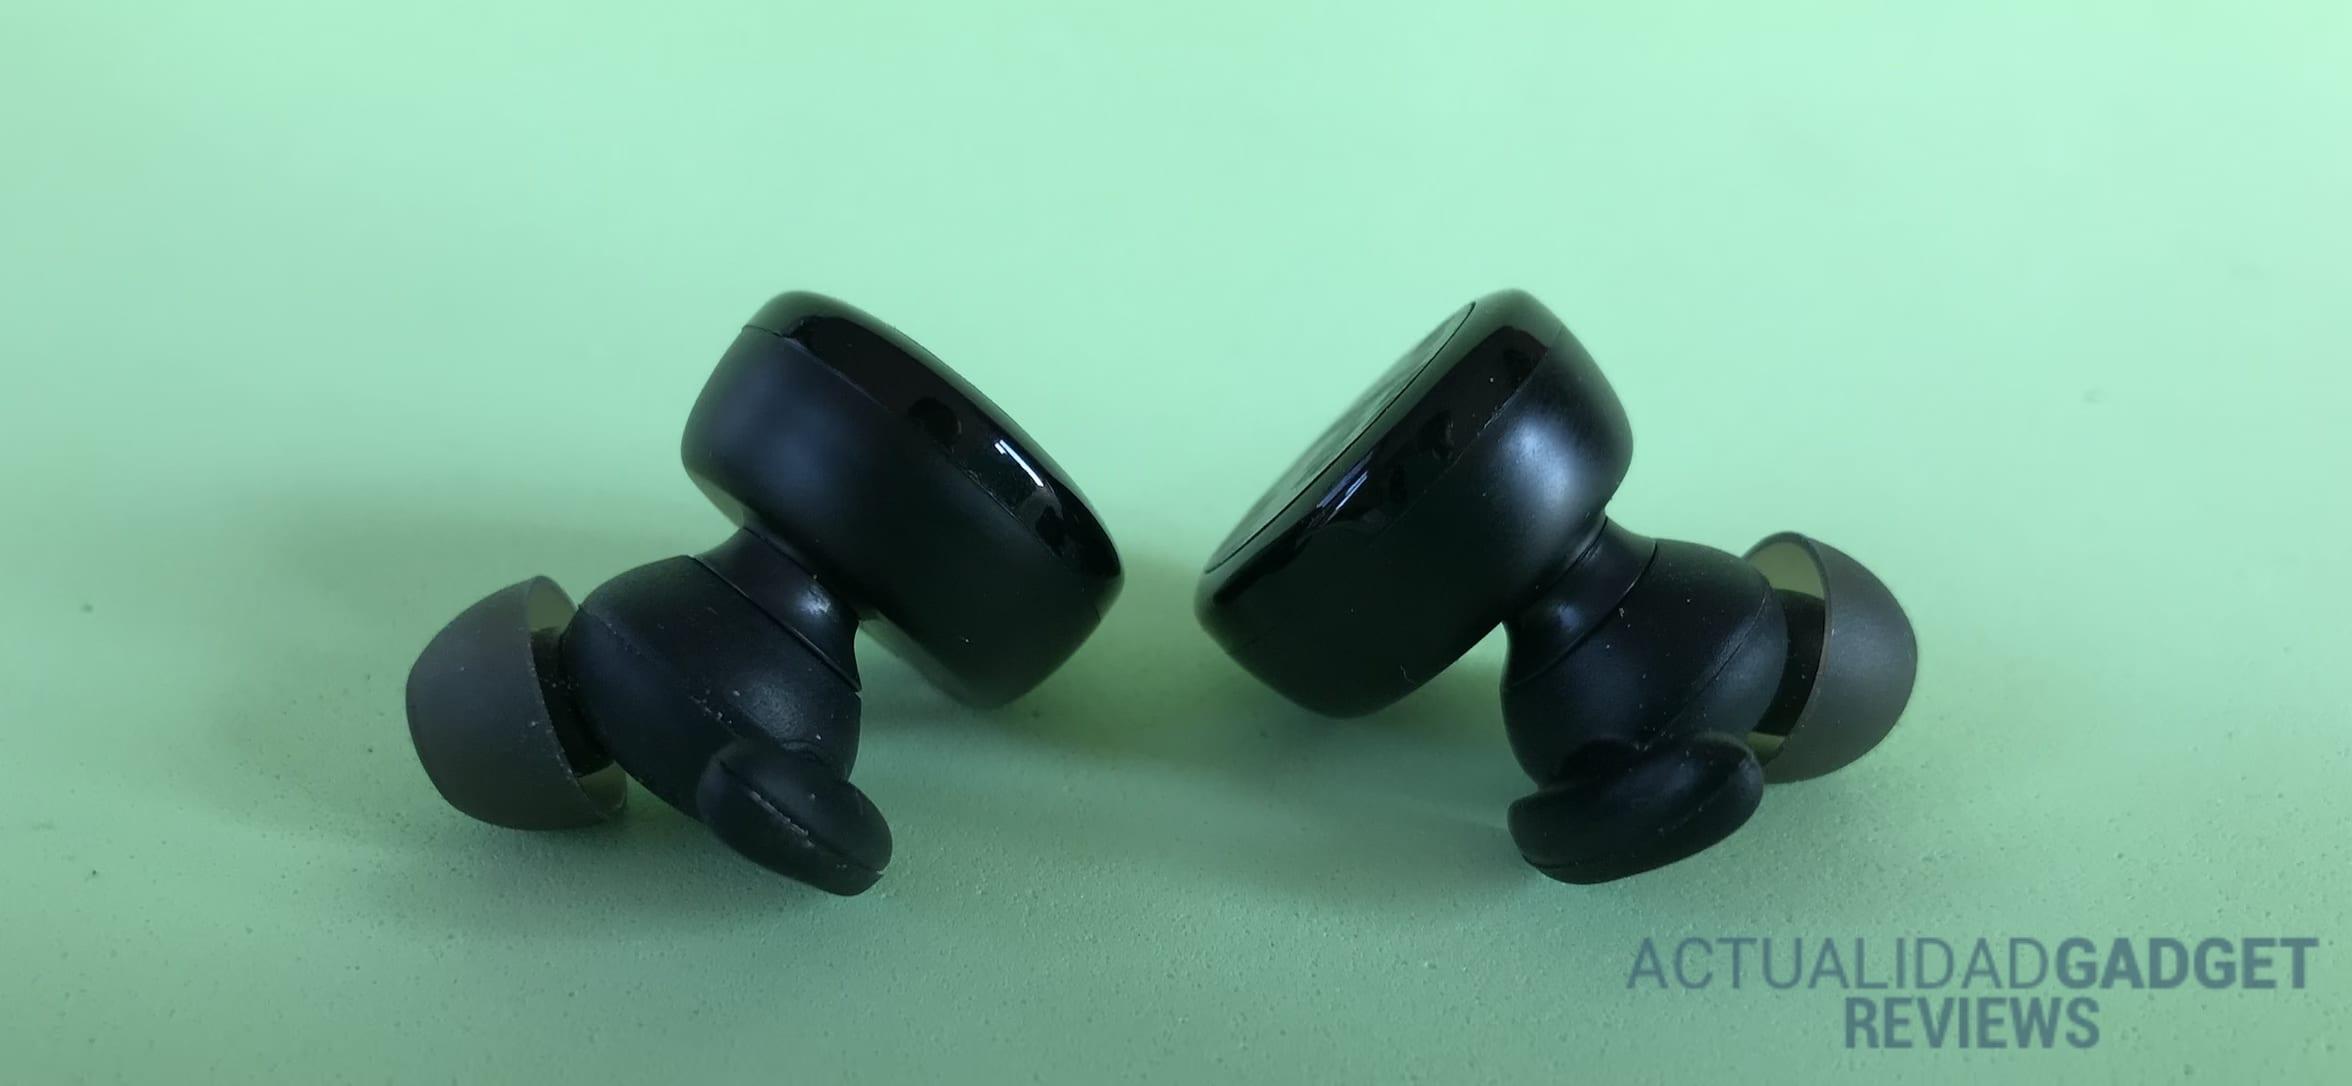 TRONSMART Encore Spunky Buds auriculares